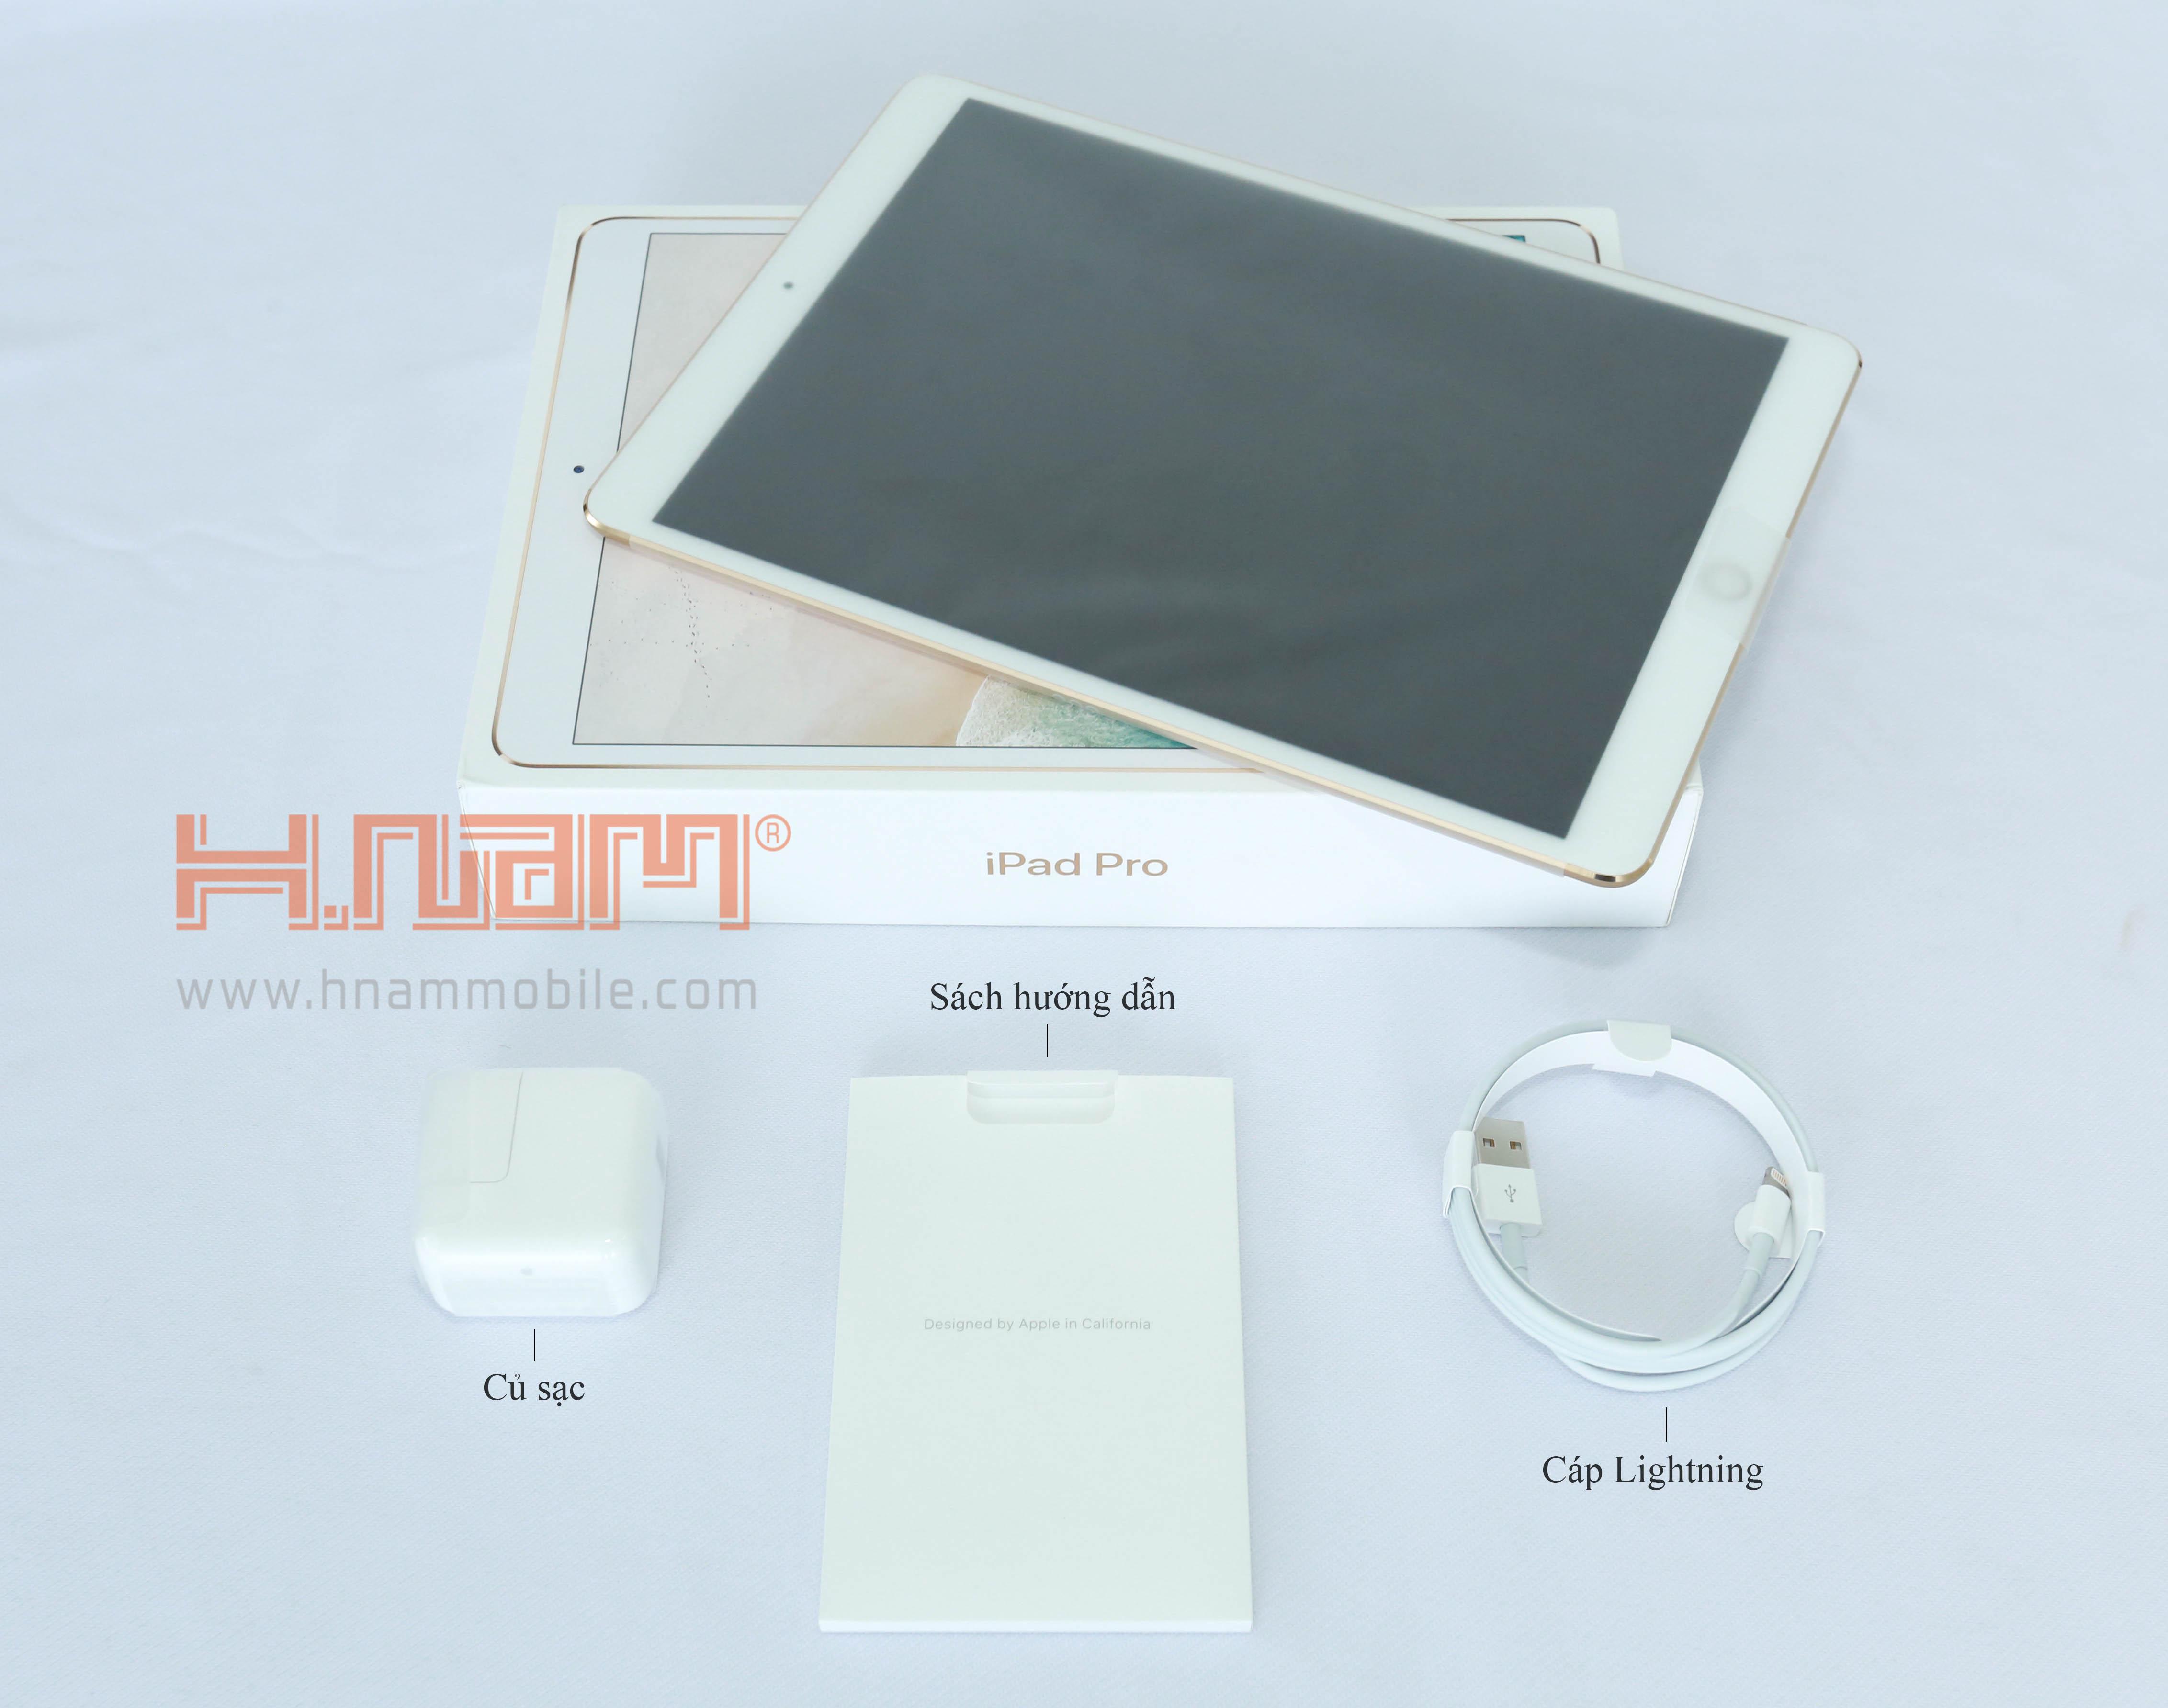 Apple iPad Pro 9.7 Cellular 32Gb hình sản phẩm 0